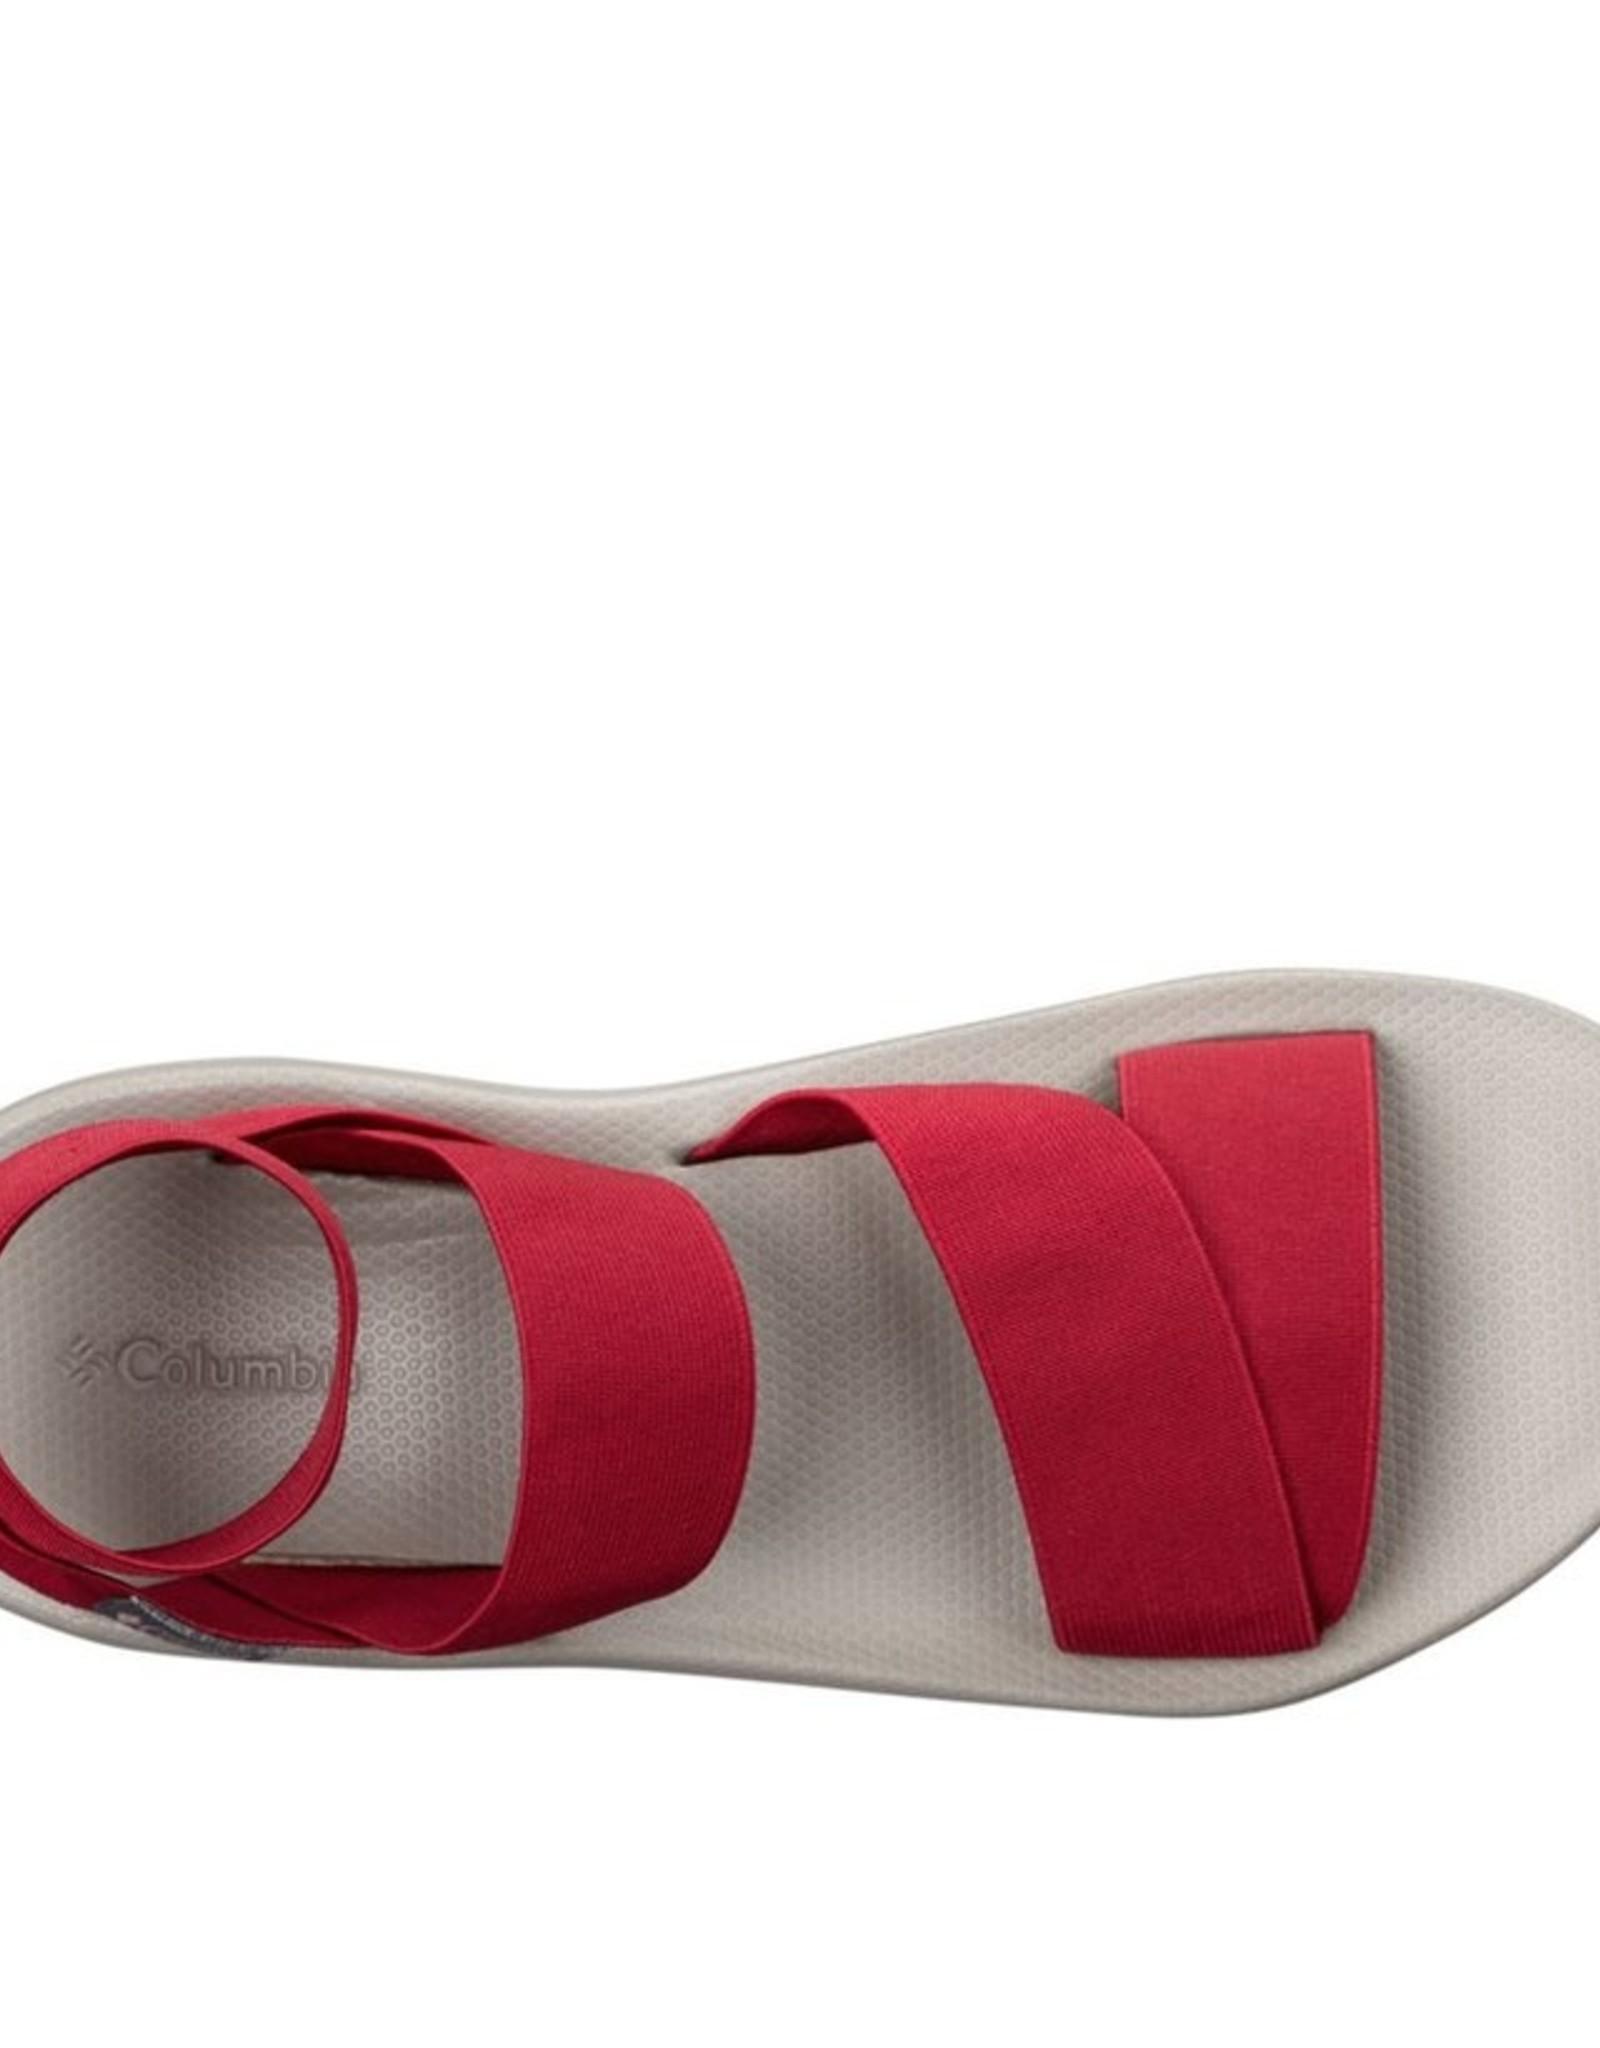 Columbia Barraca strap sandal